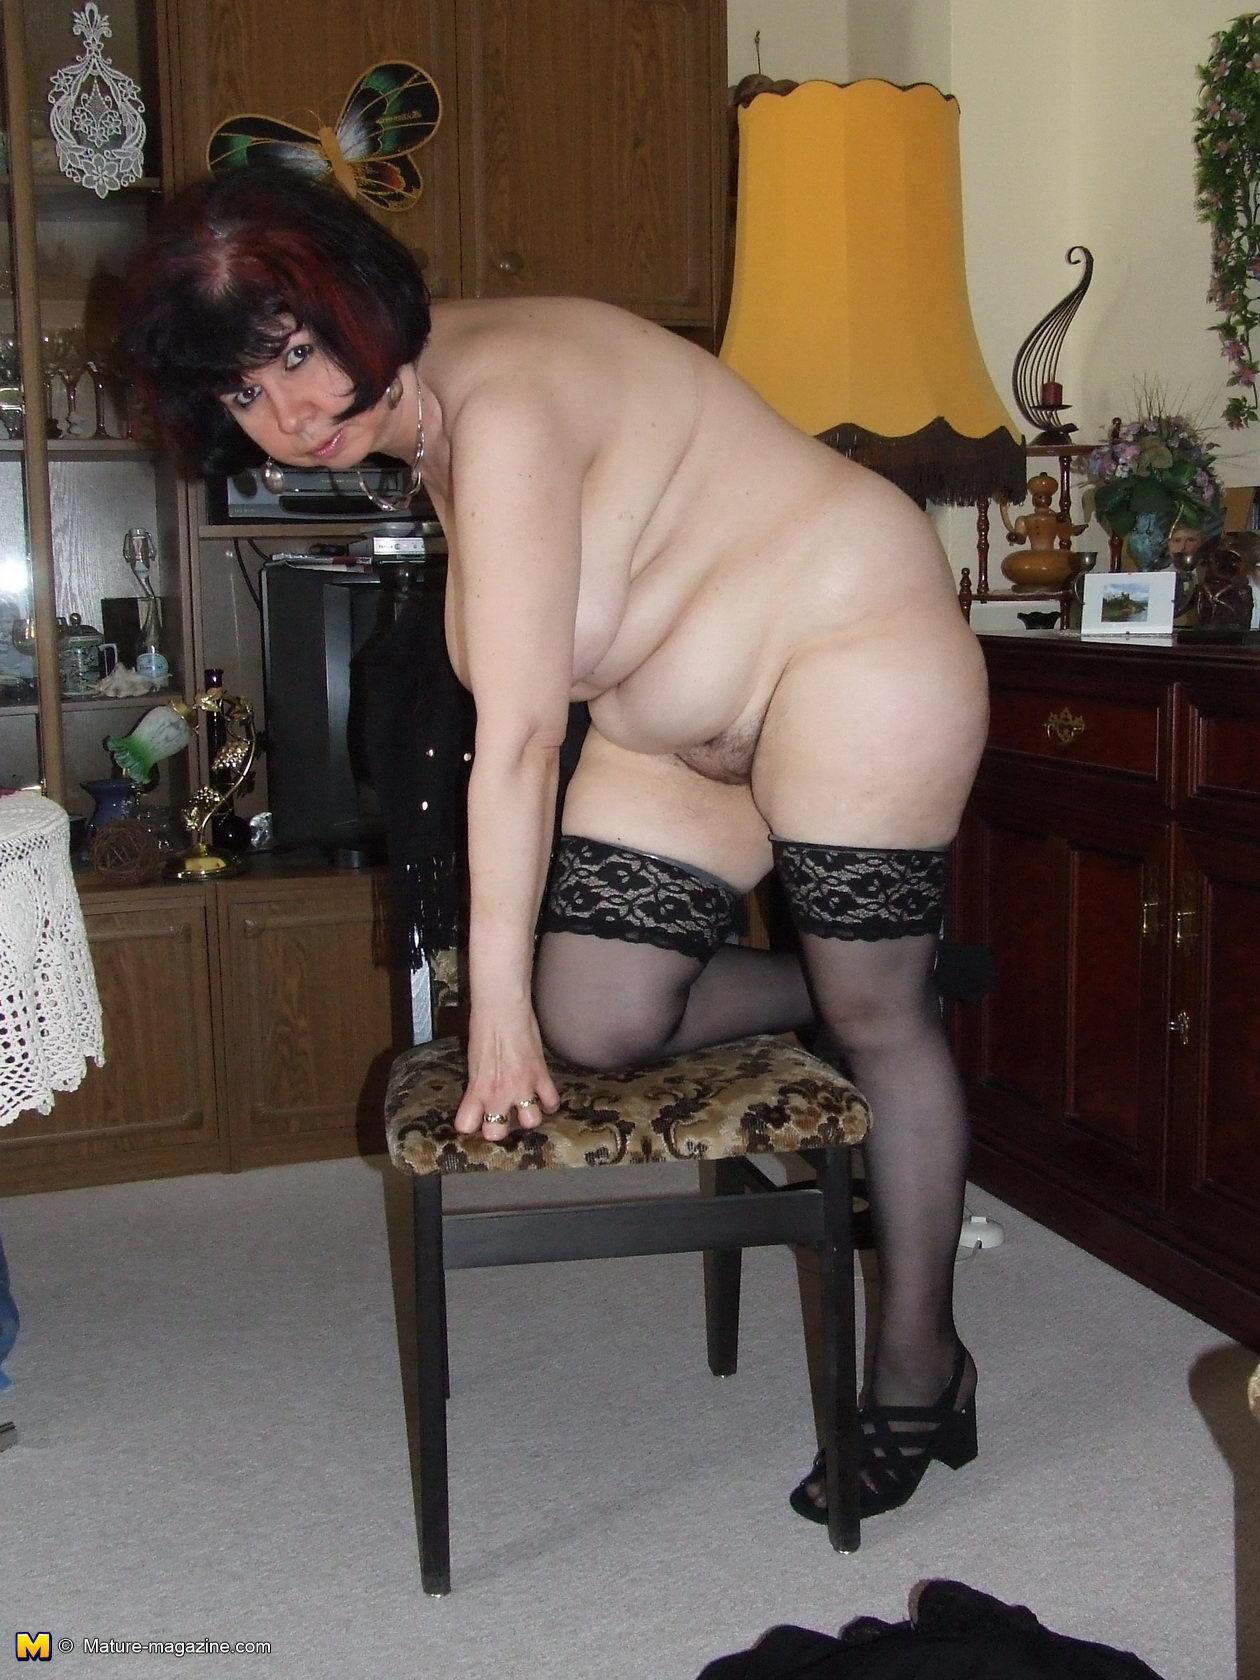 Living room wrestling mature women have hit